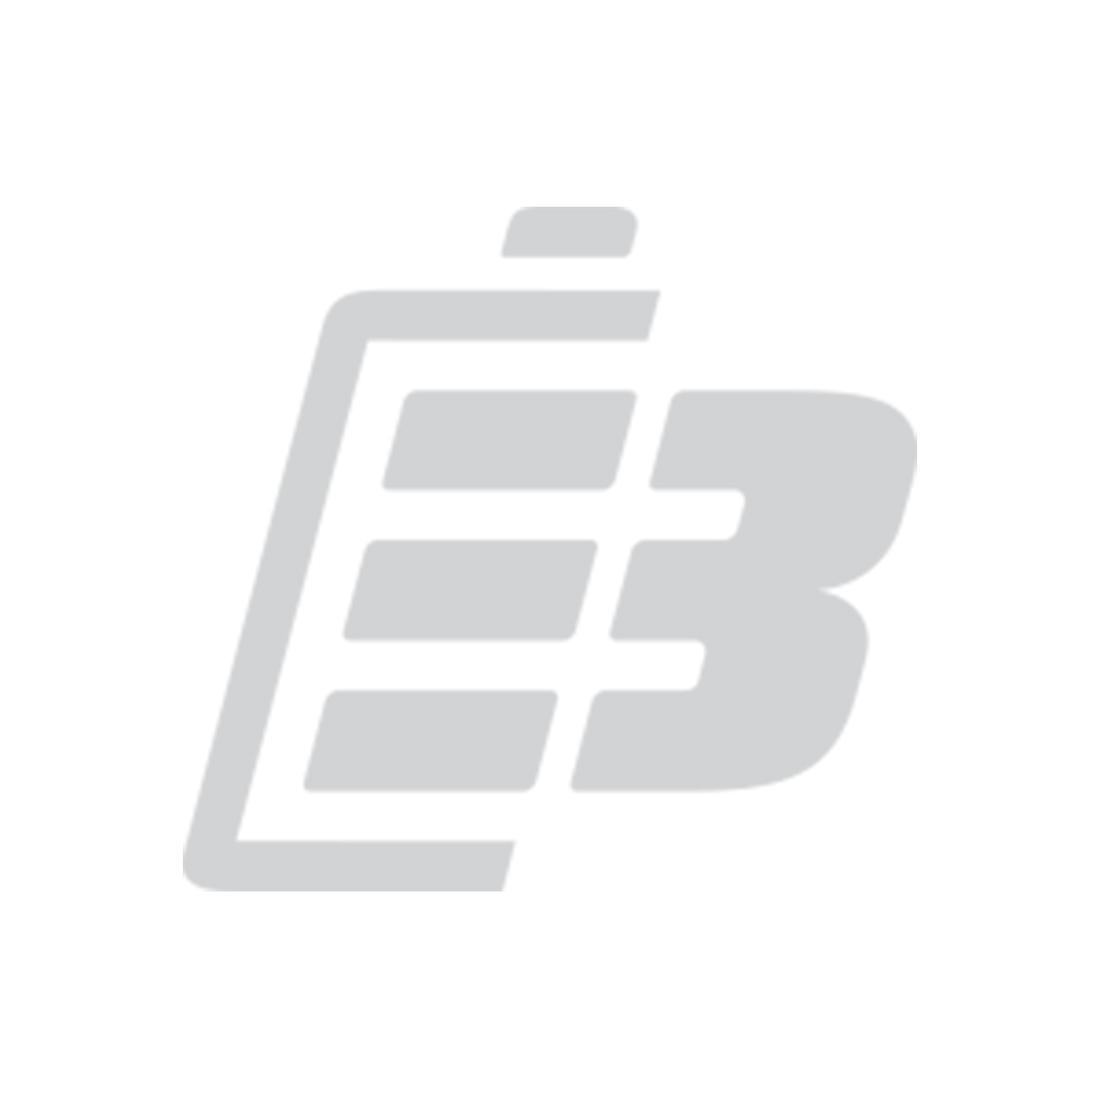 Barcode scanner battery Intermec 730 Color_1